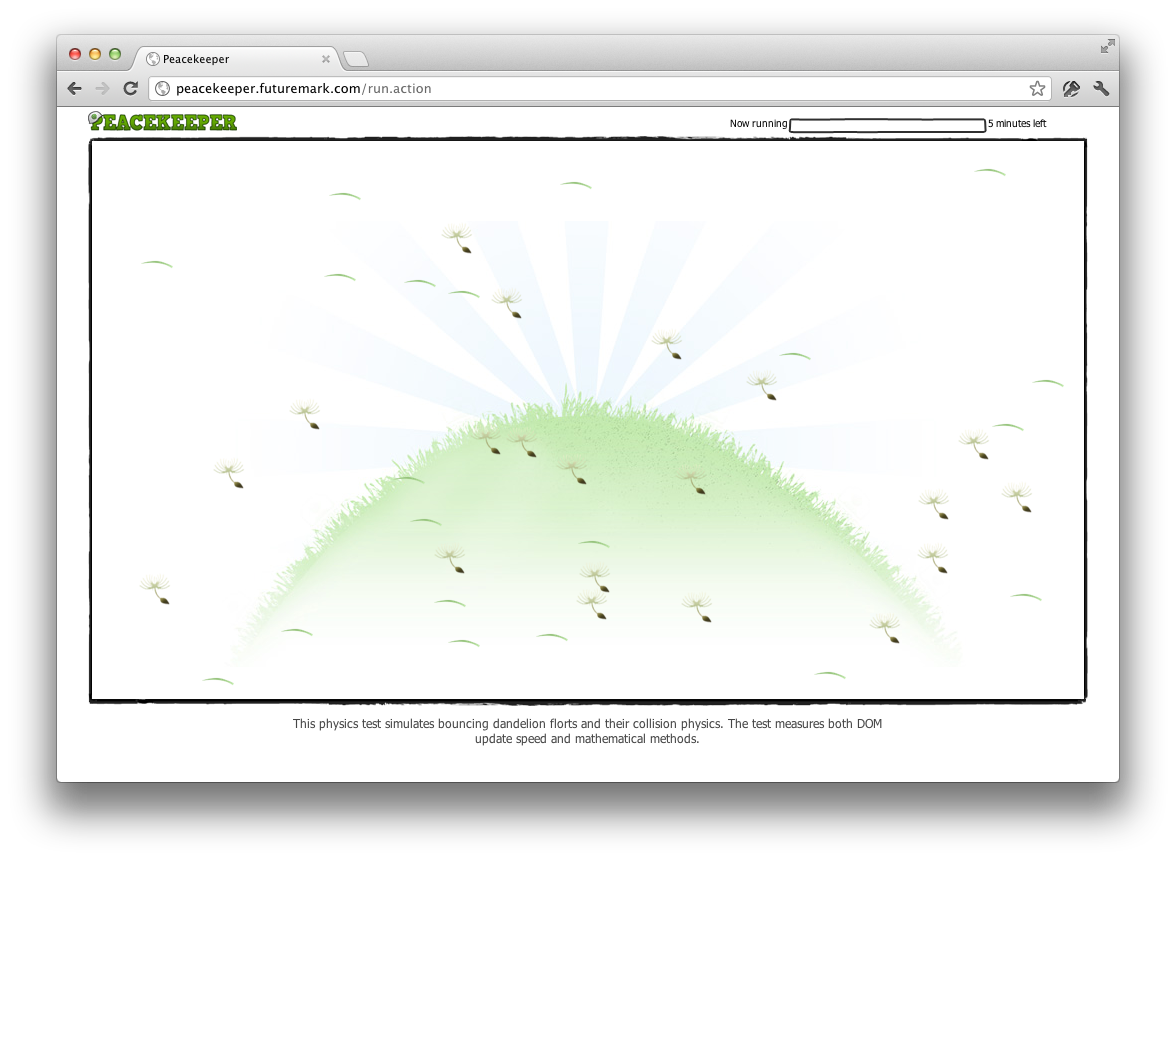 Peacekeeper: Browser-Benchmark bescheinigt Safari Stillstand - Browser-Benchmark Peacekeeper von Futuremark